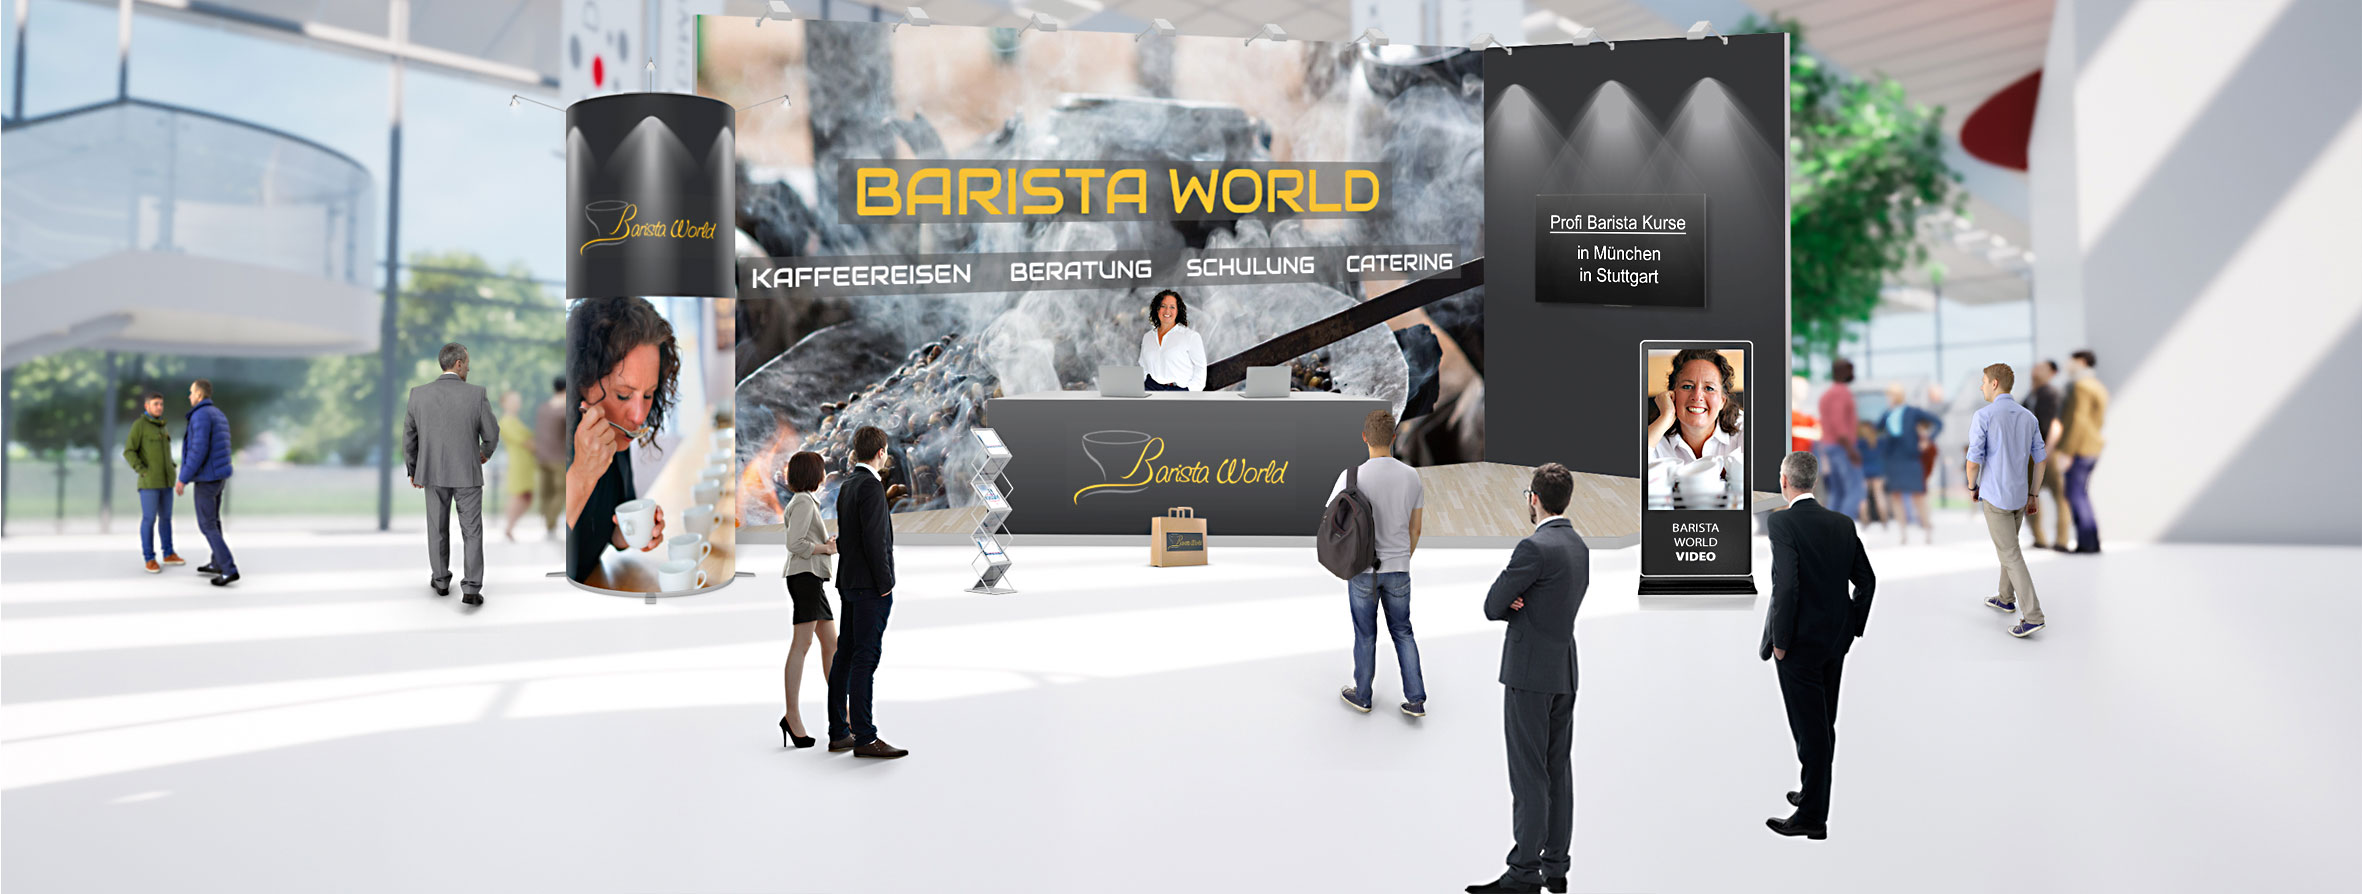 Barista World Vendtra Vending Trade Festival Deutschland